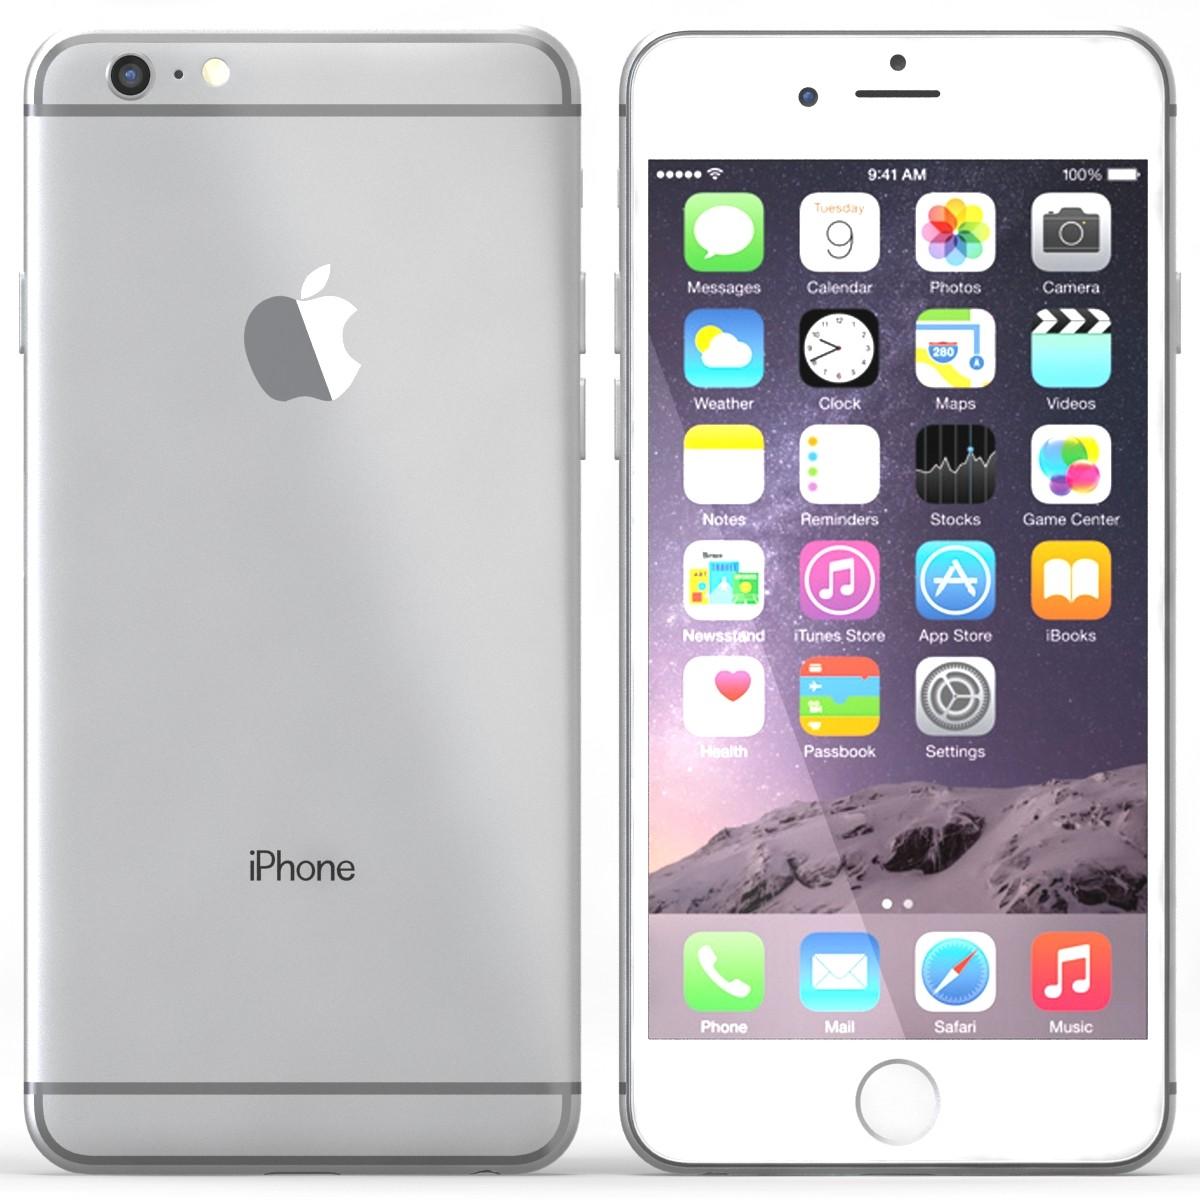 APPLE iPhone 6 16GB - Silver